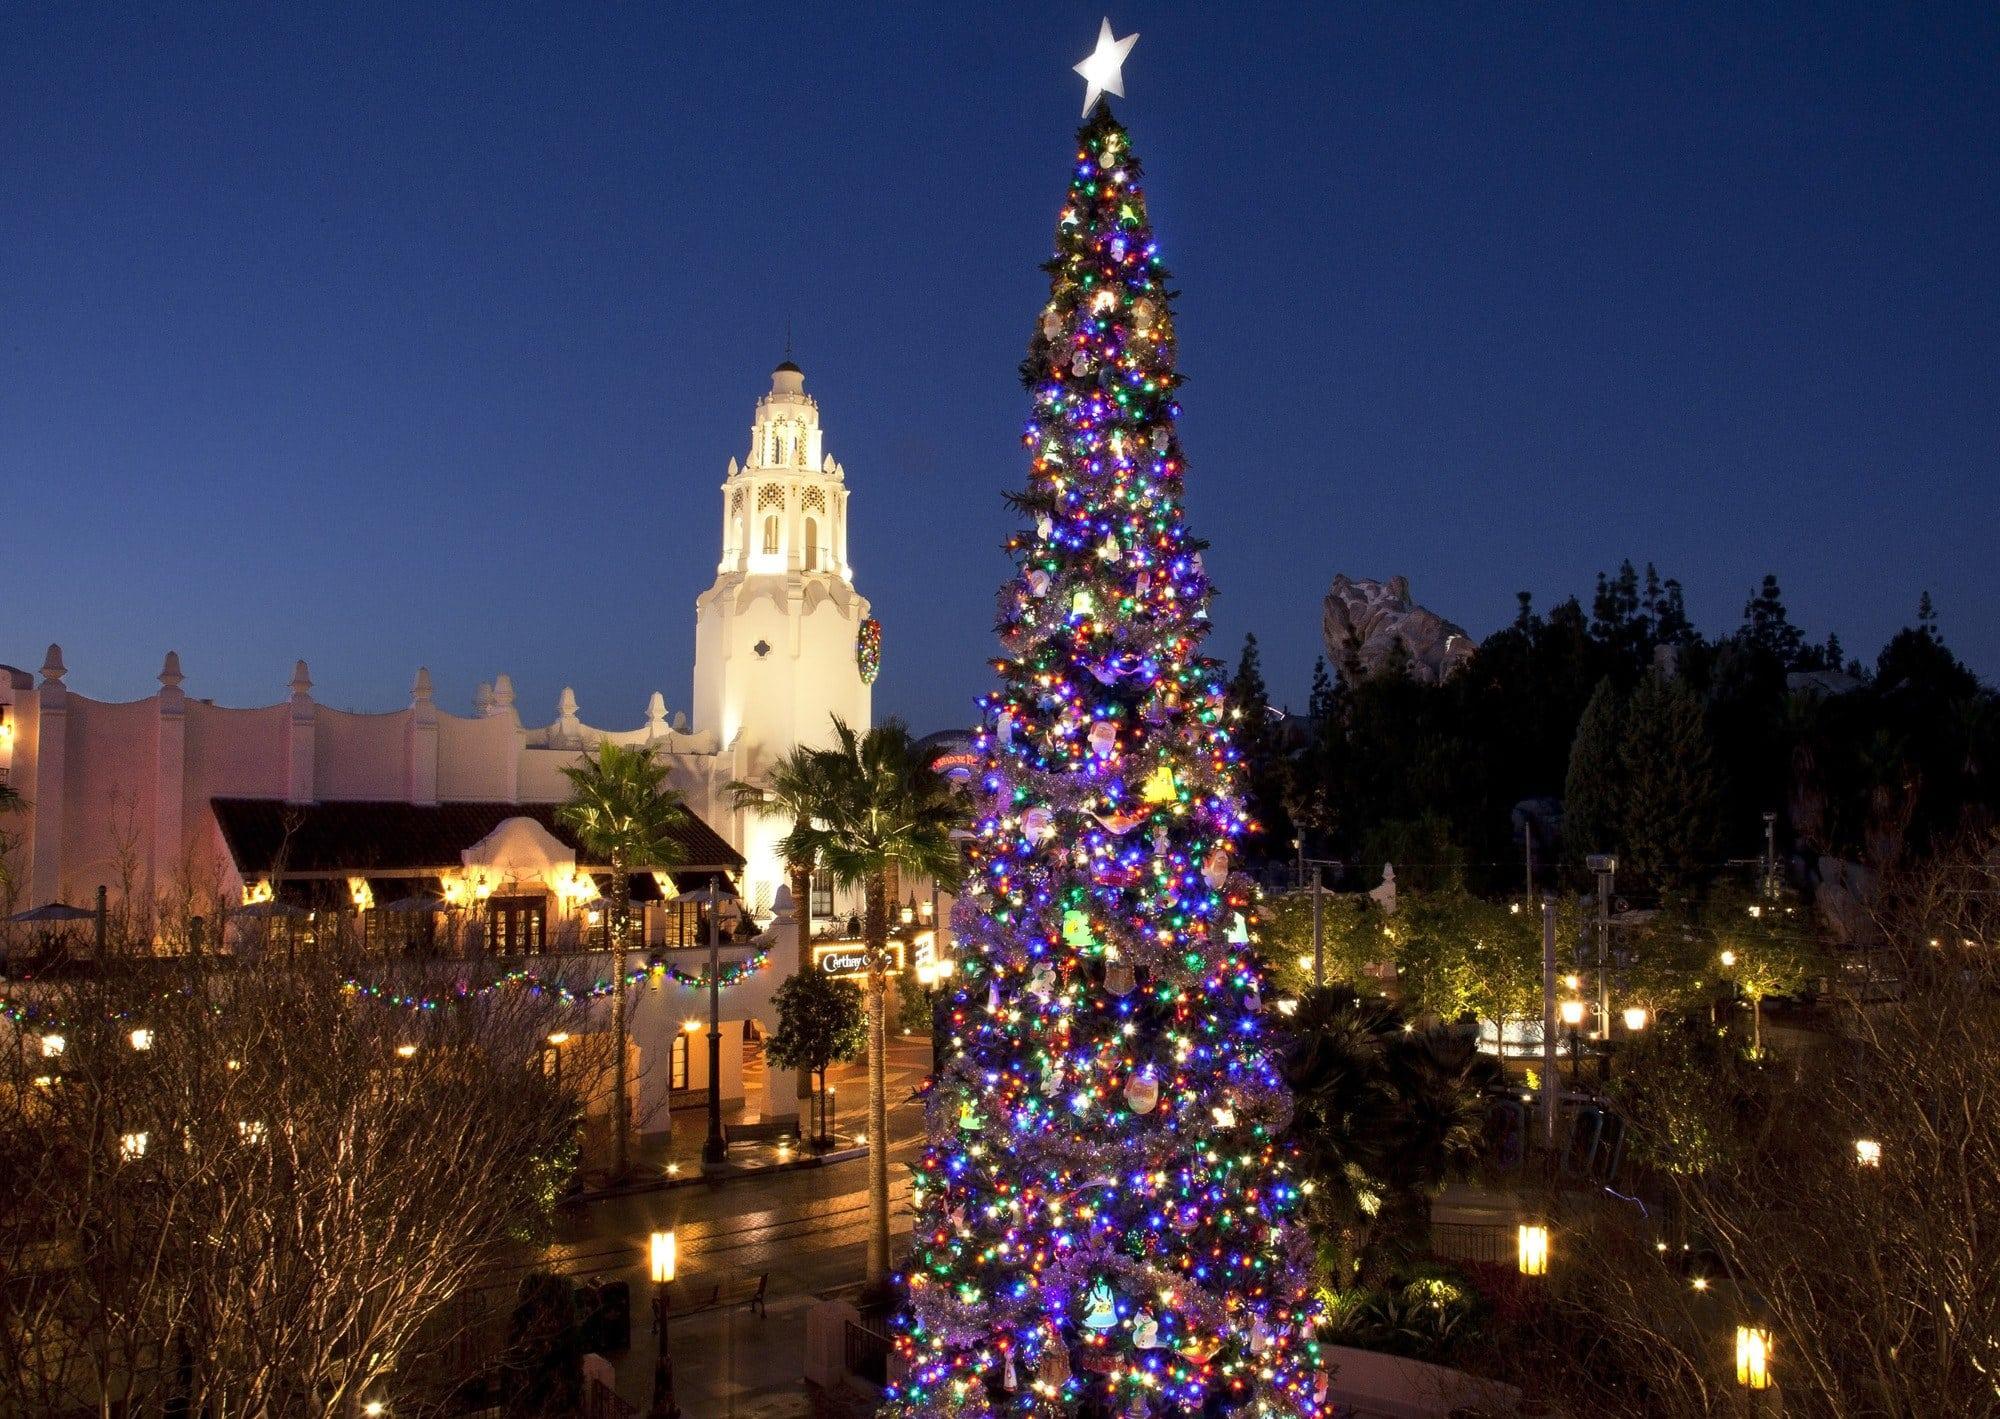 Christmas tree at Disney California Adventure Park at Disneyland during the holidays